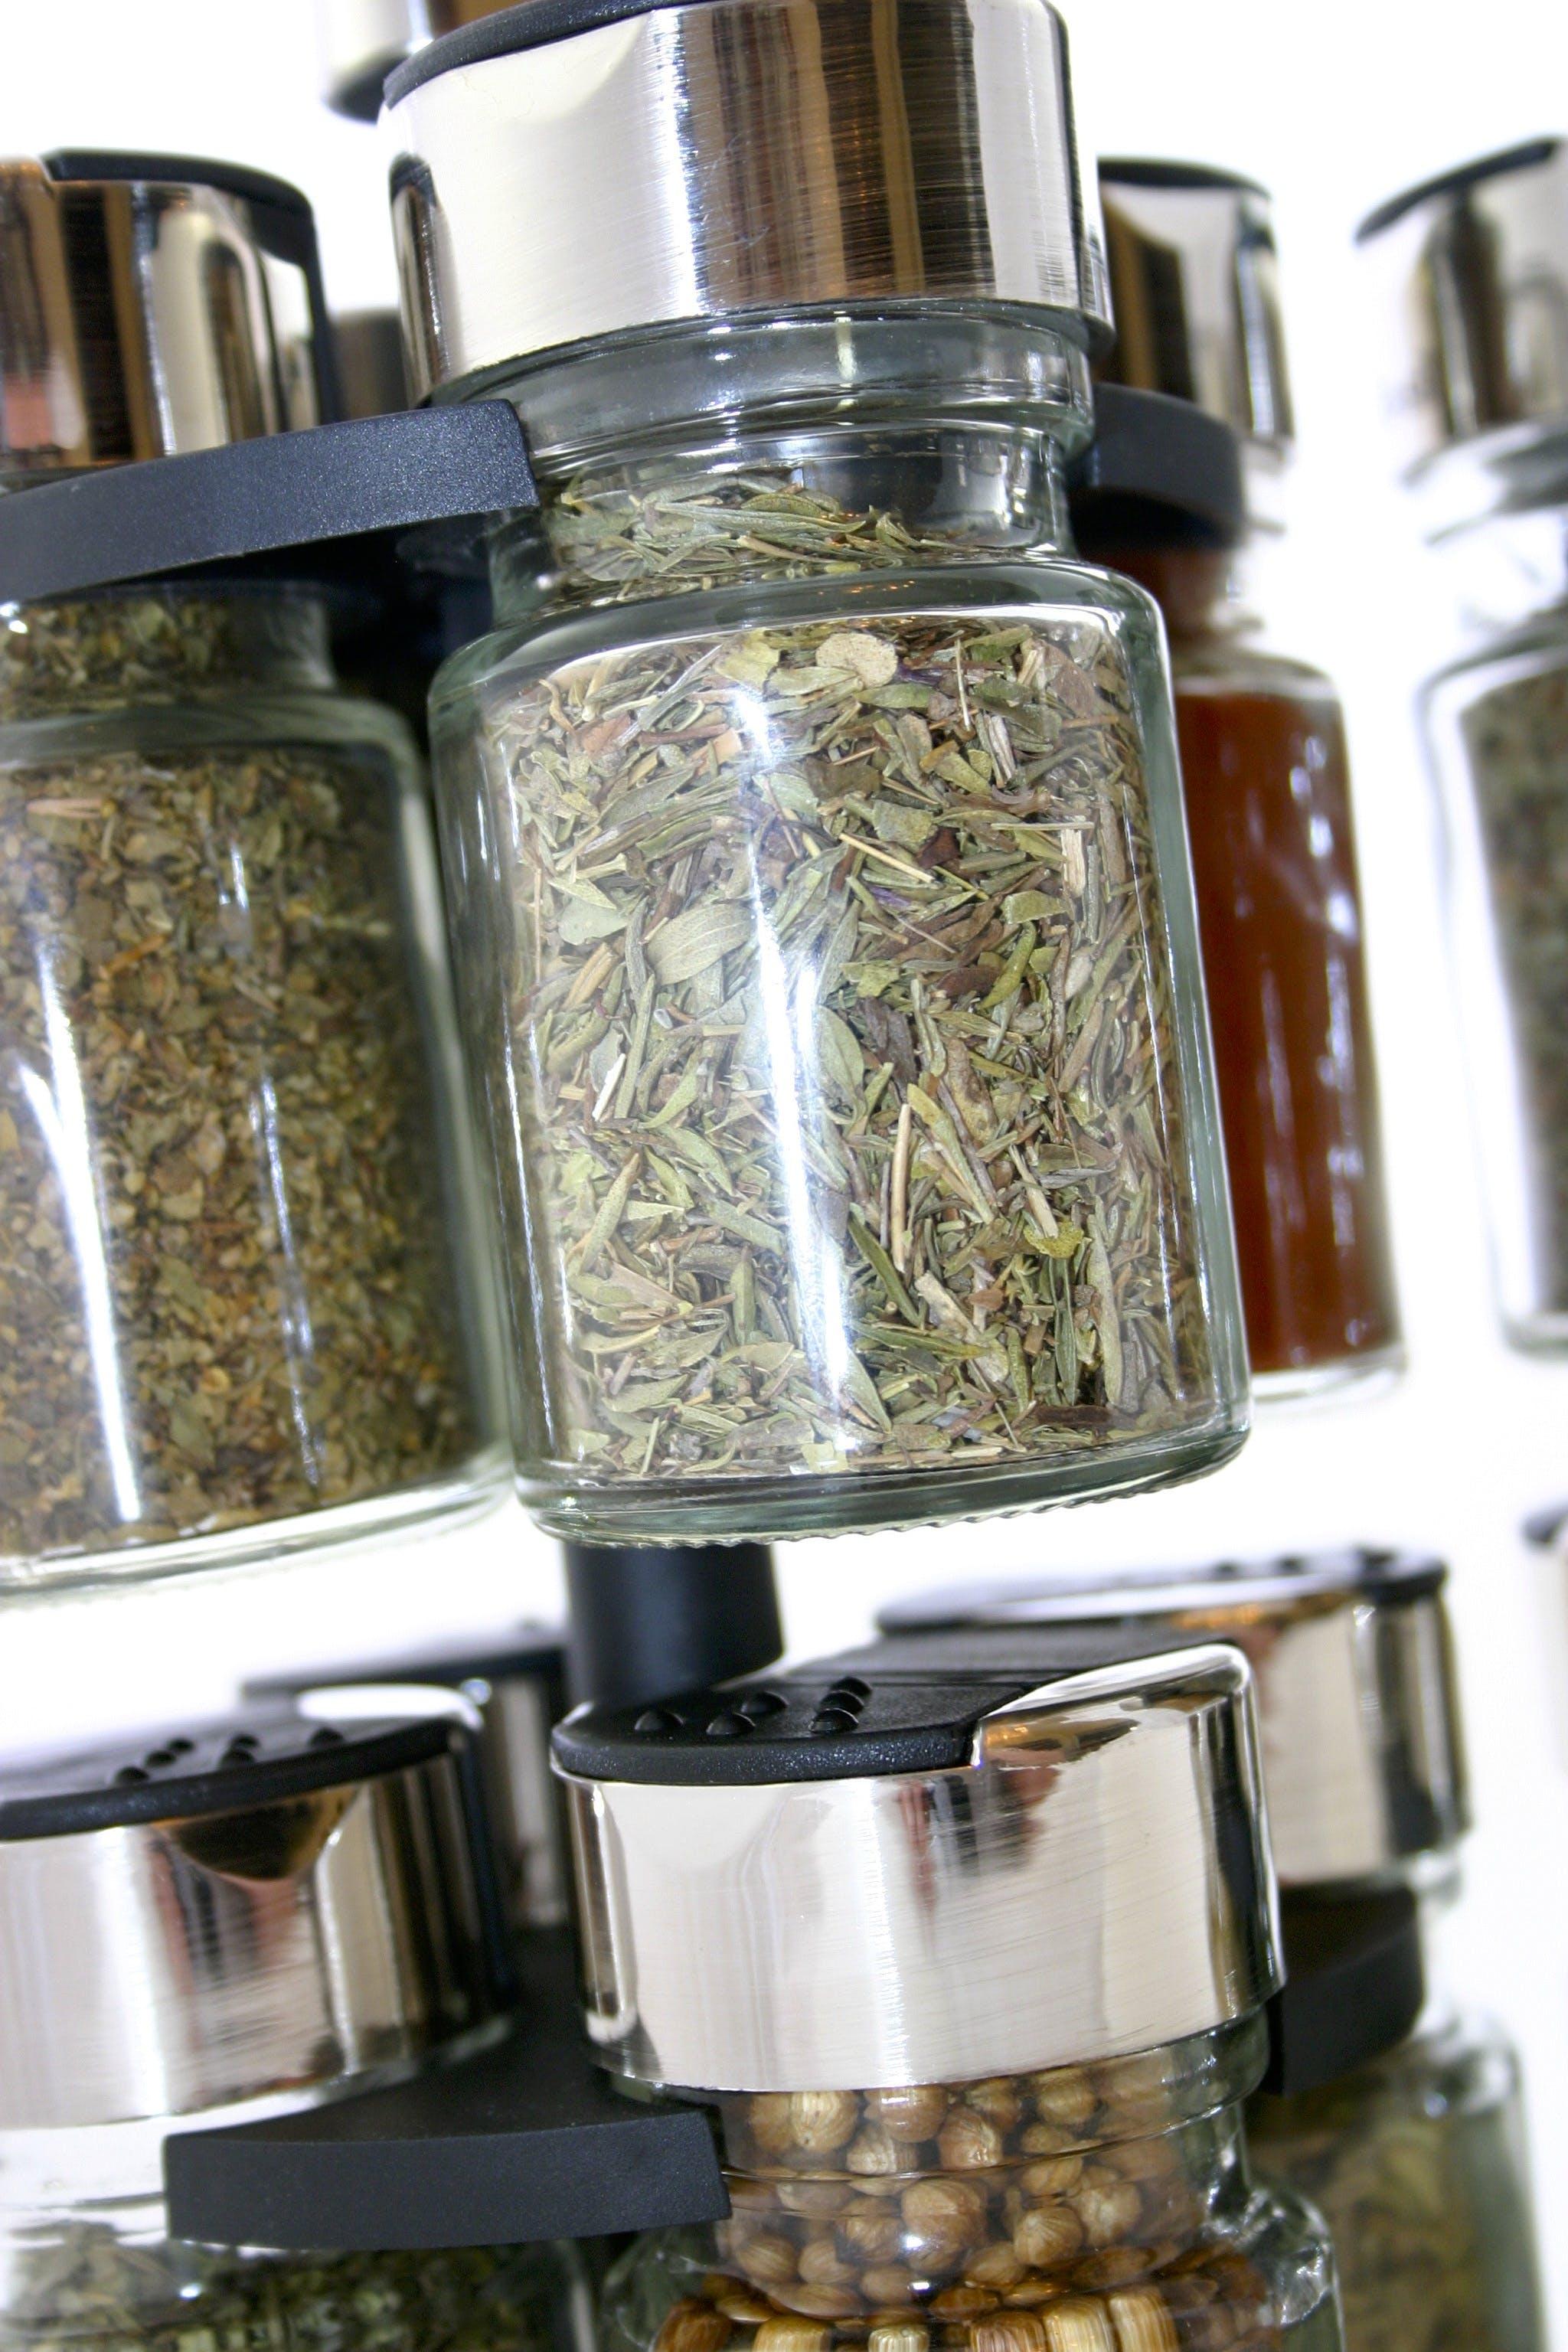 Free stock photo of herbs